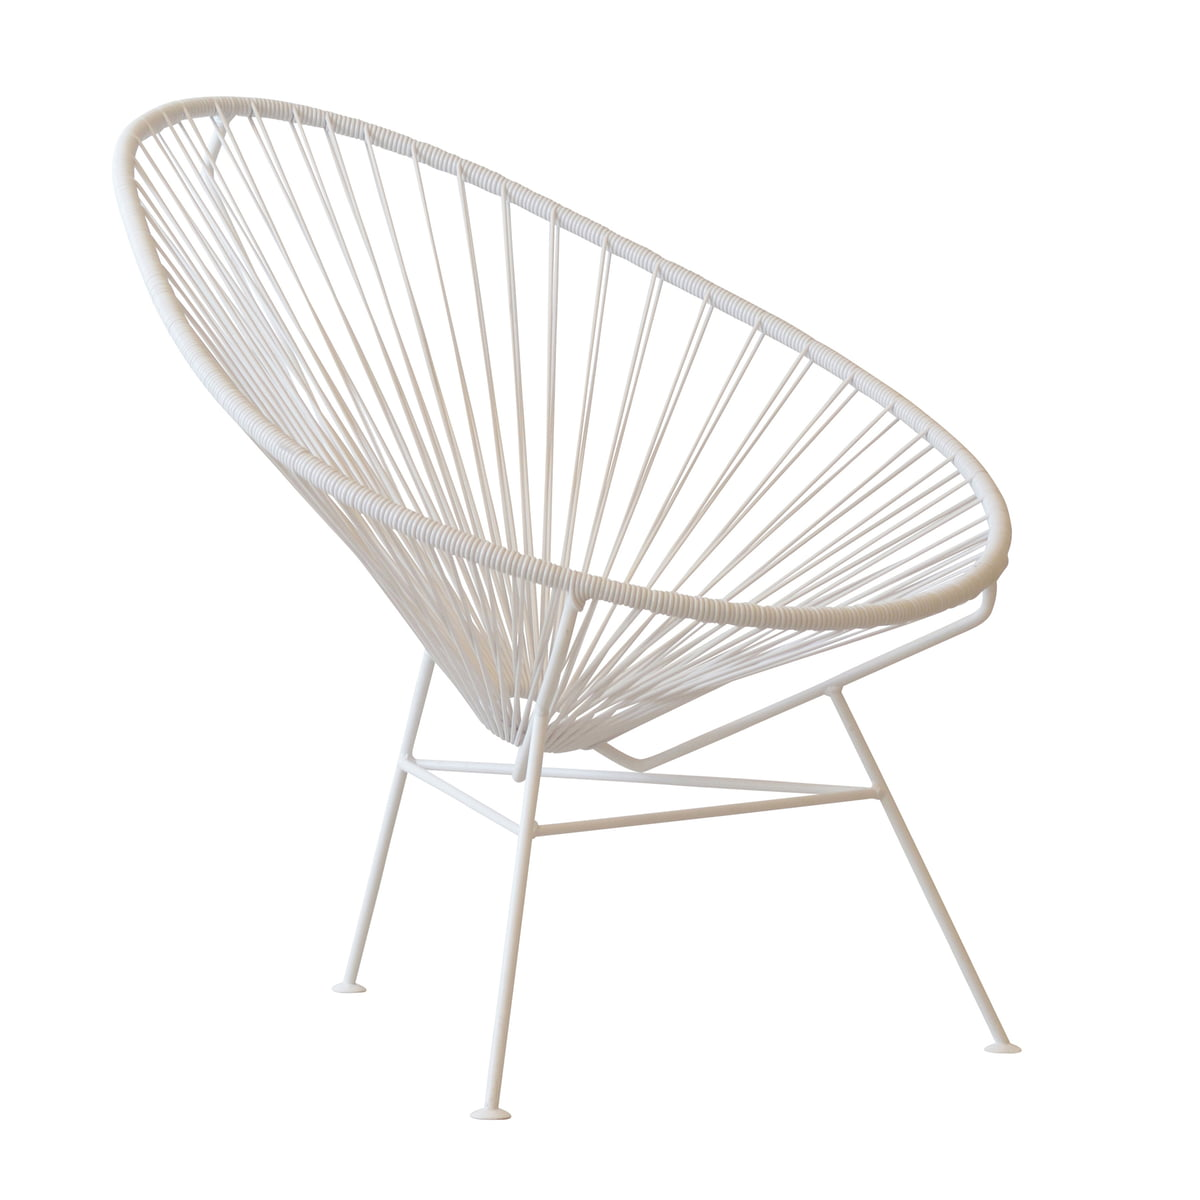 Acapulco chair dimensions - Ok Design The Acapulco Chair White